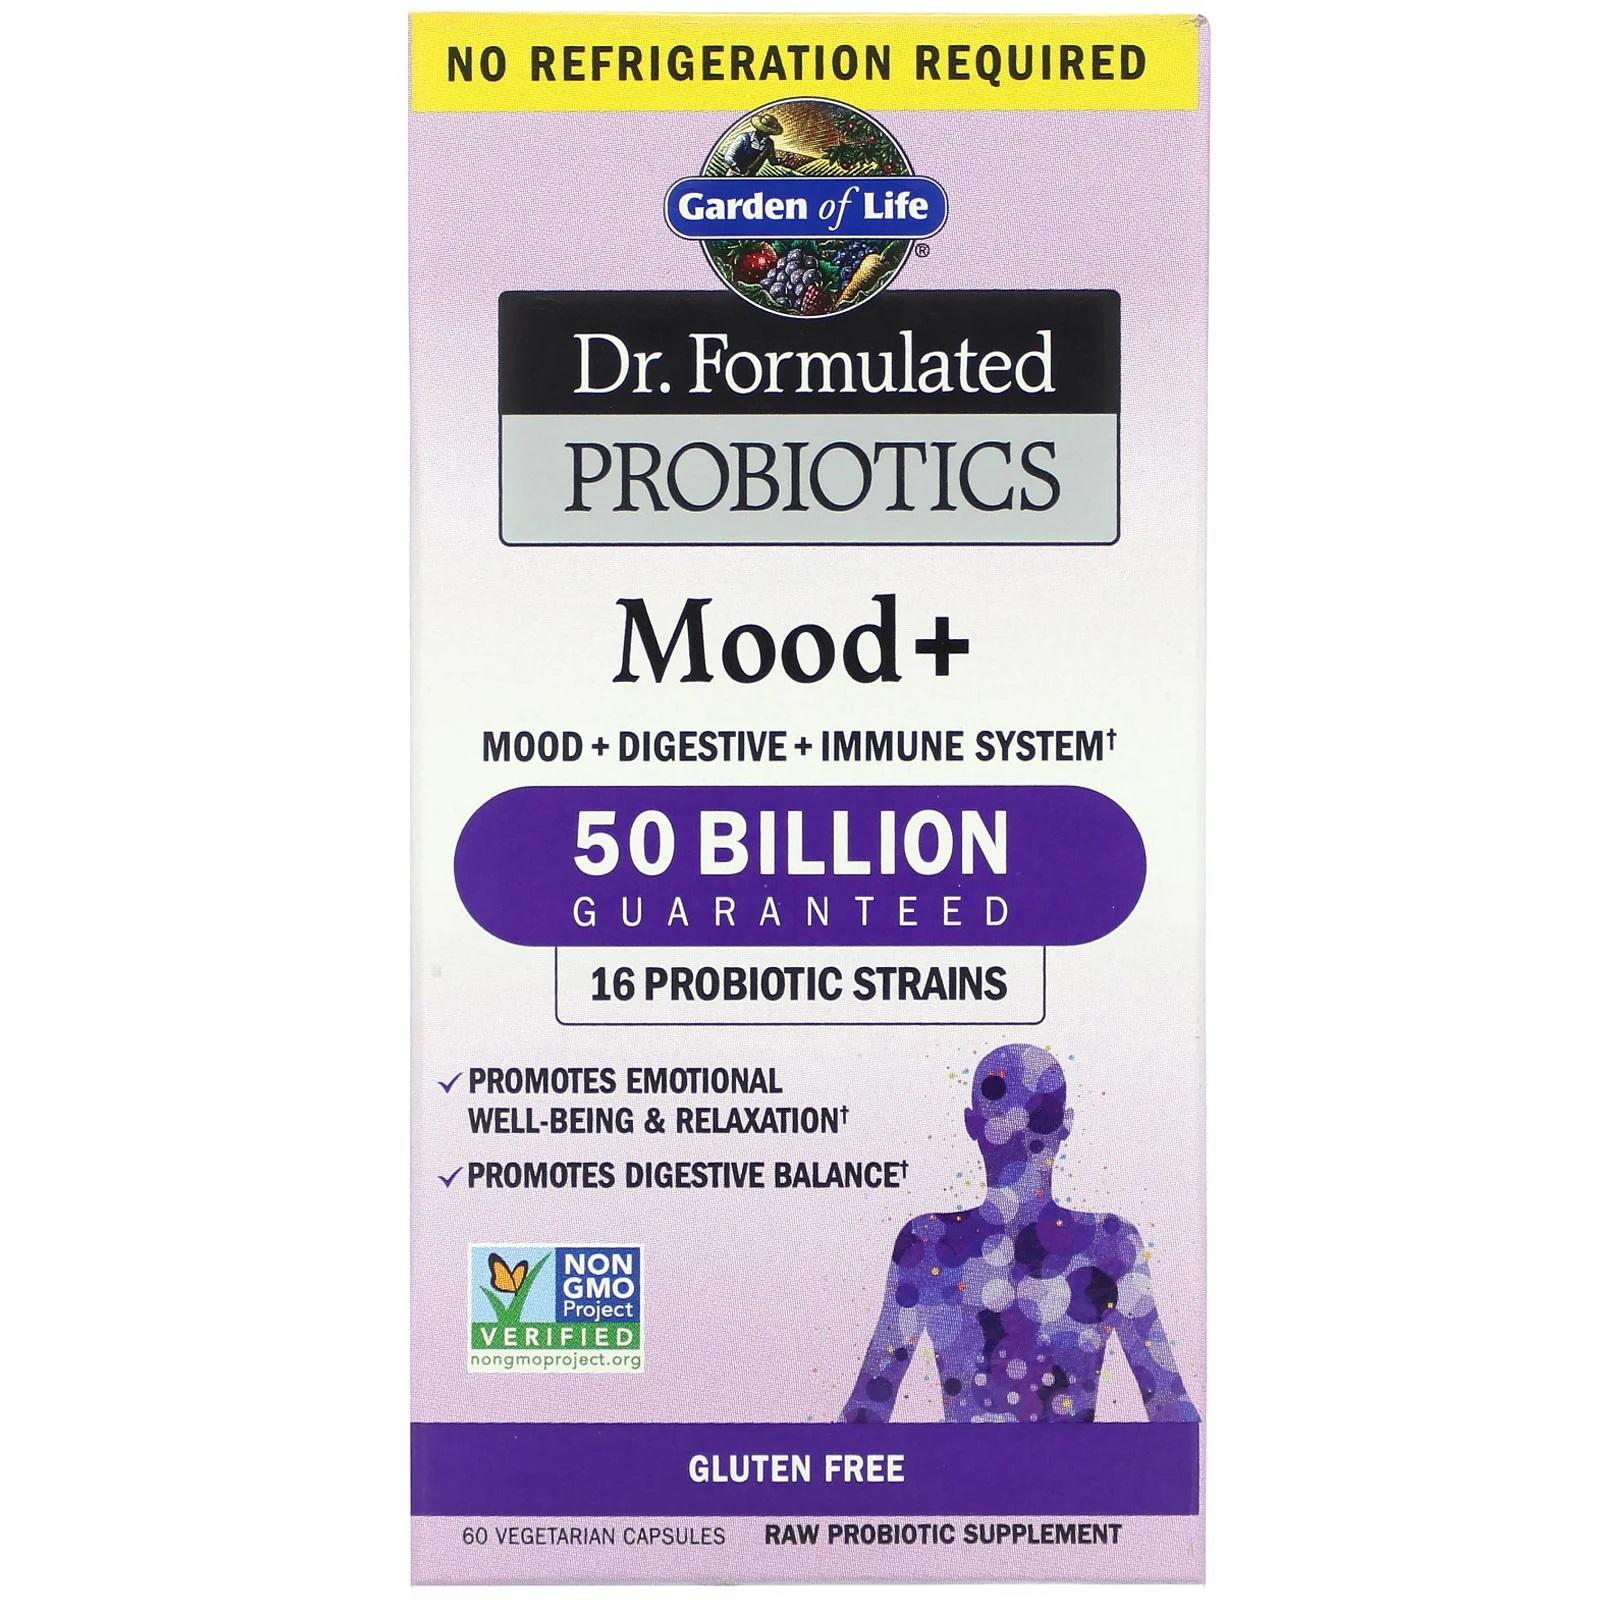 Image of Dr. Formulated Probiotics Mood+ (60 Vegetarian Capsules) - Garden of Life 0658010120043